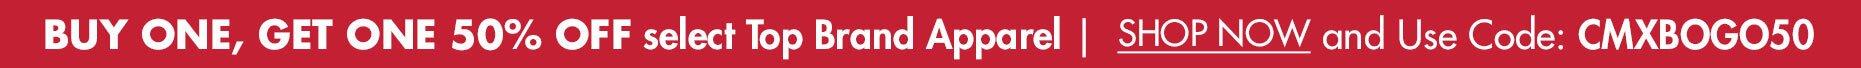 BOGO 50% OFF All Noble Apparel & Favorites from Other Top Brands!